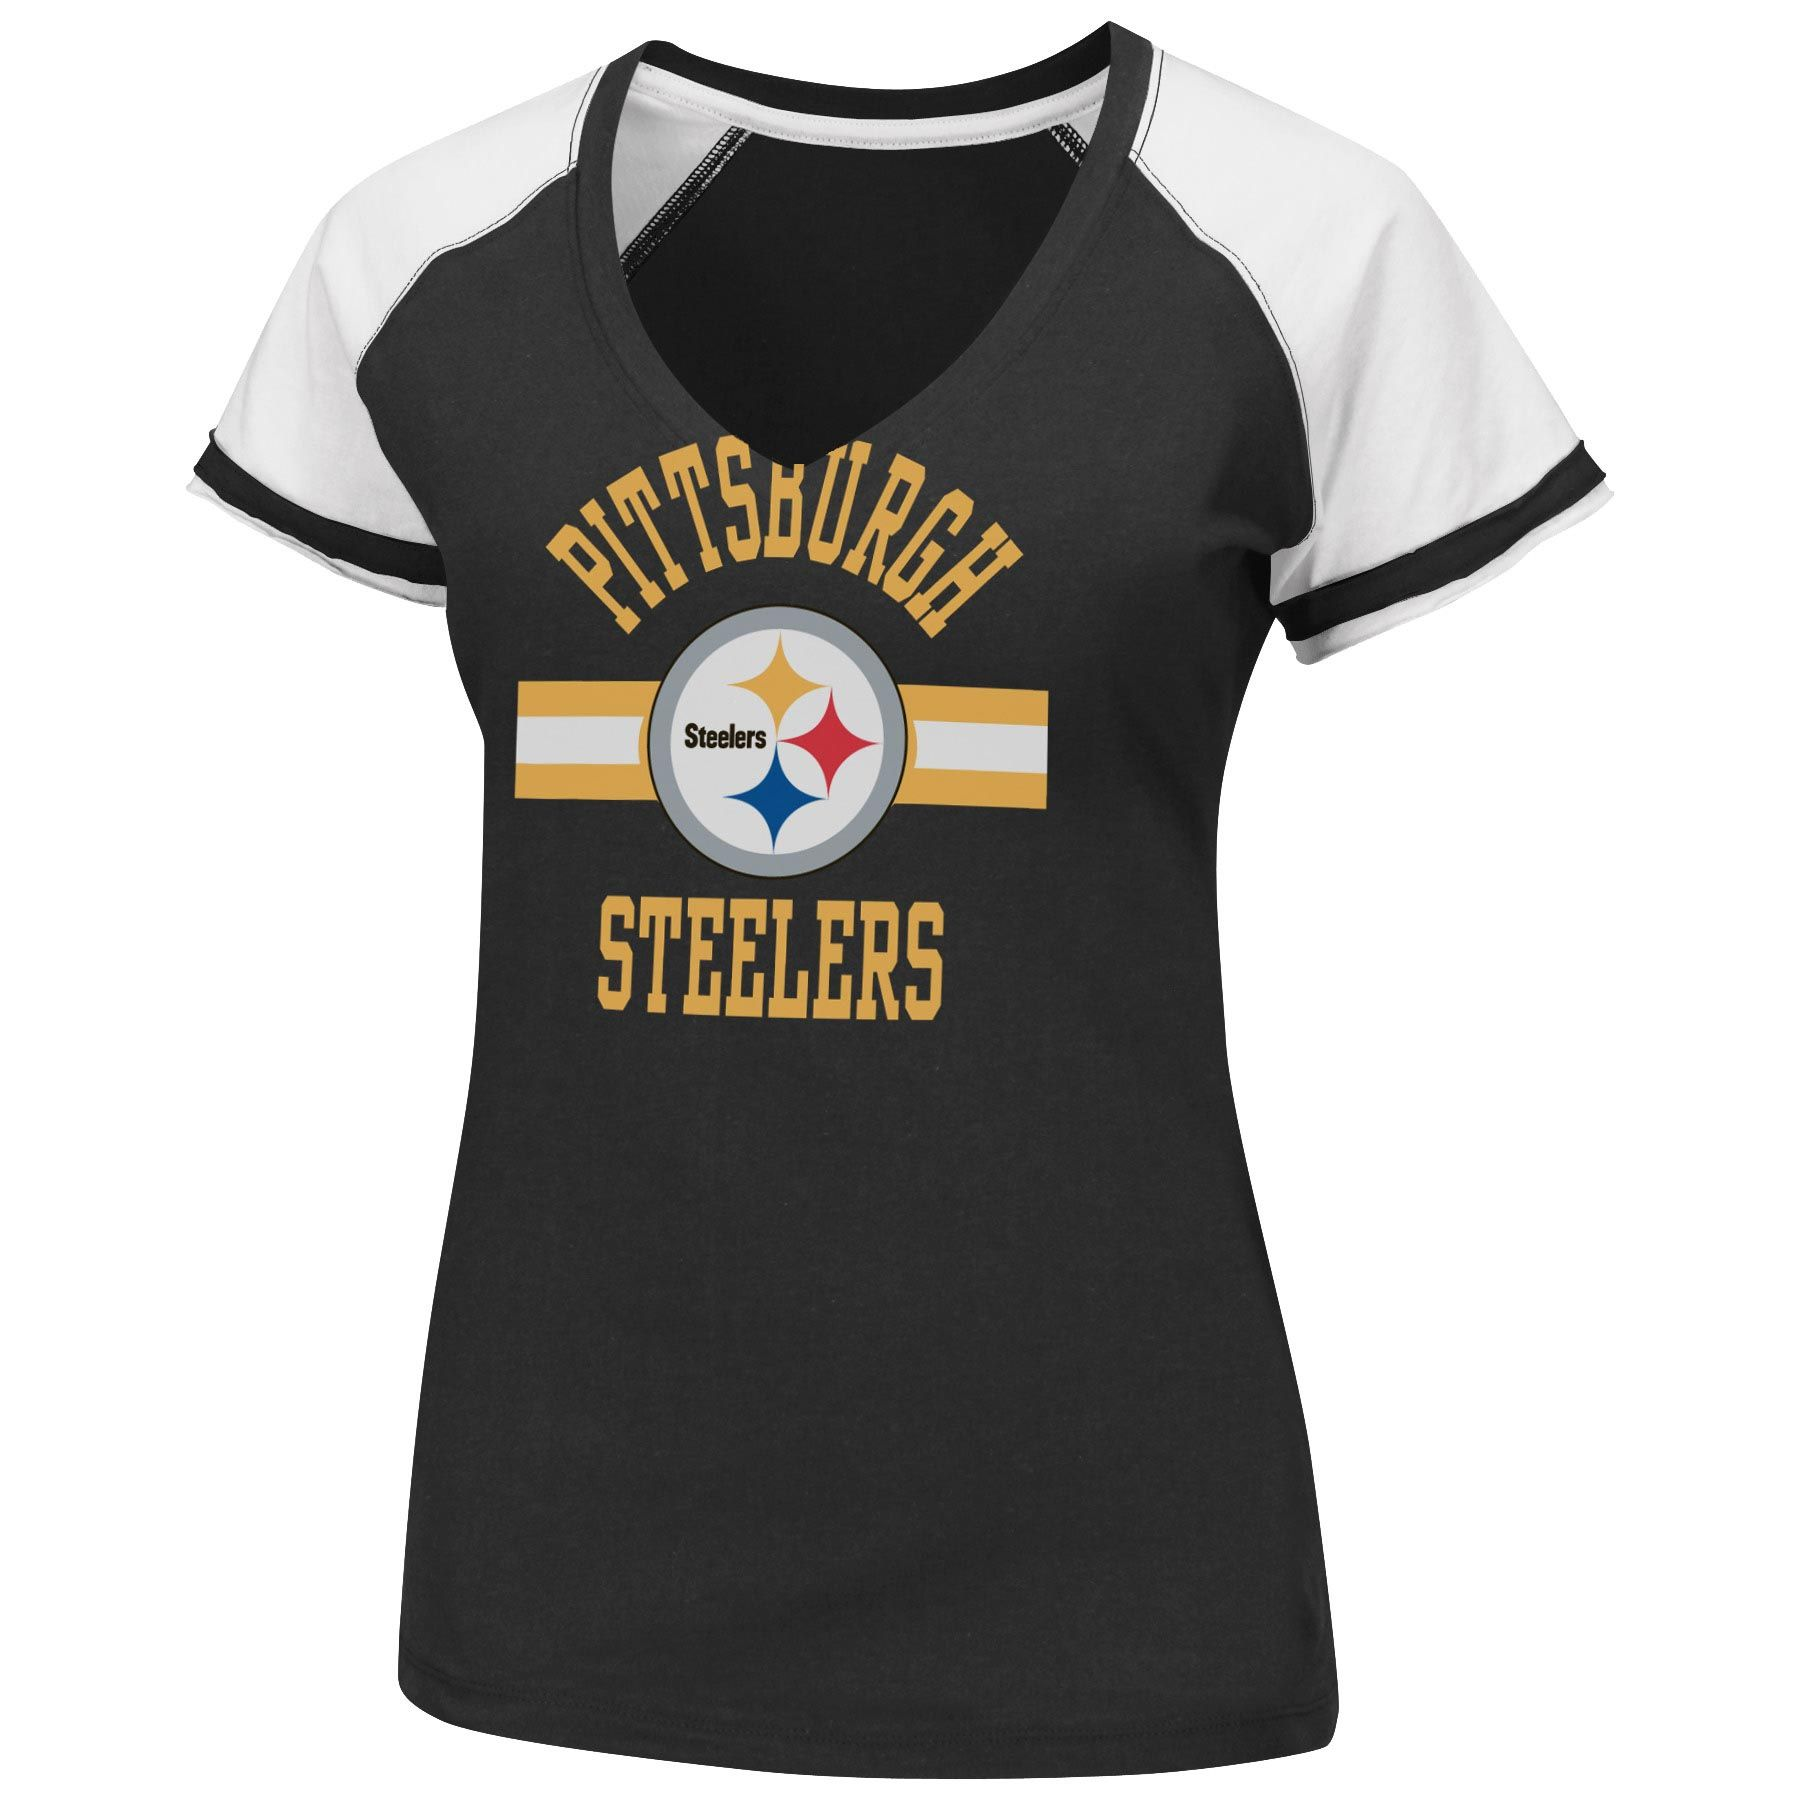 steelers jersey canada